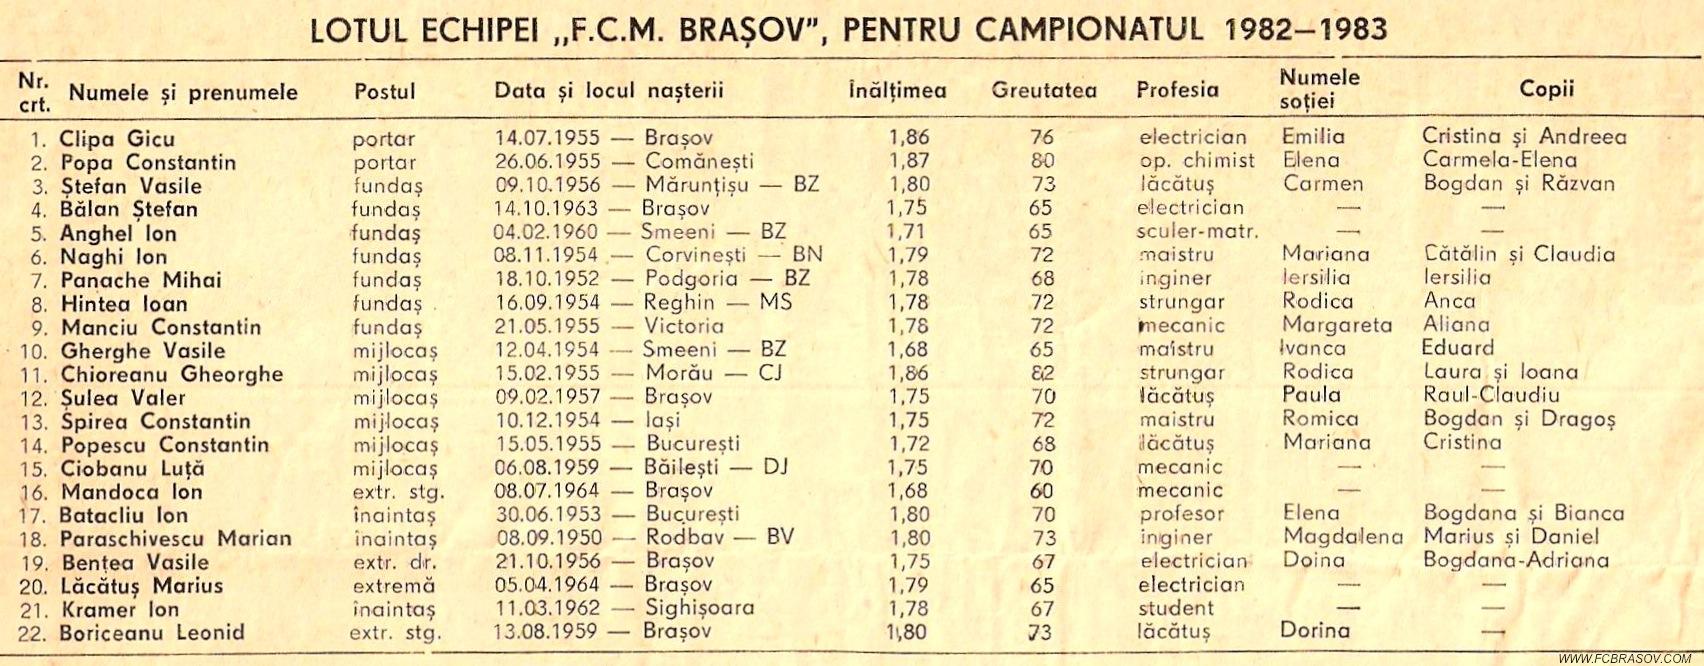 Tabel 1982